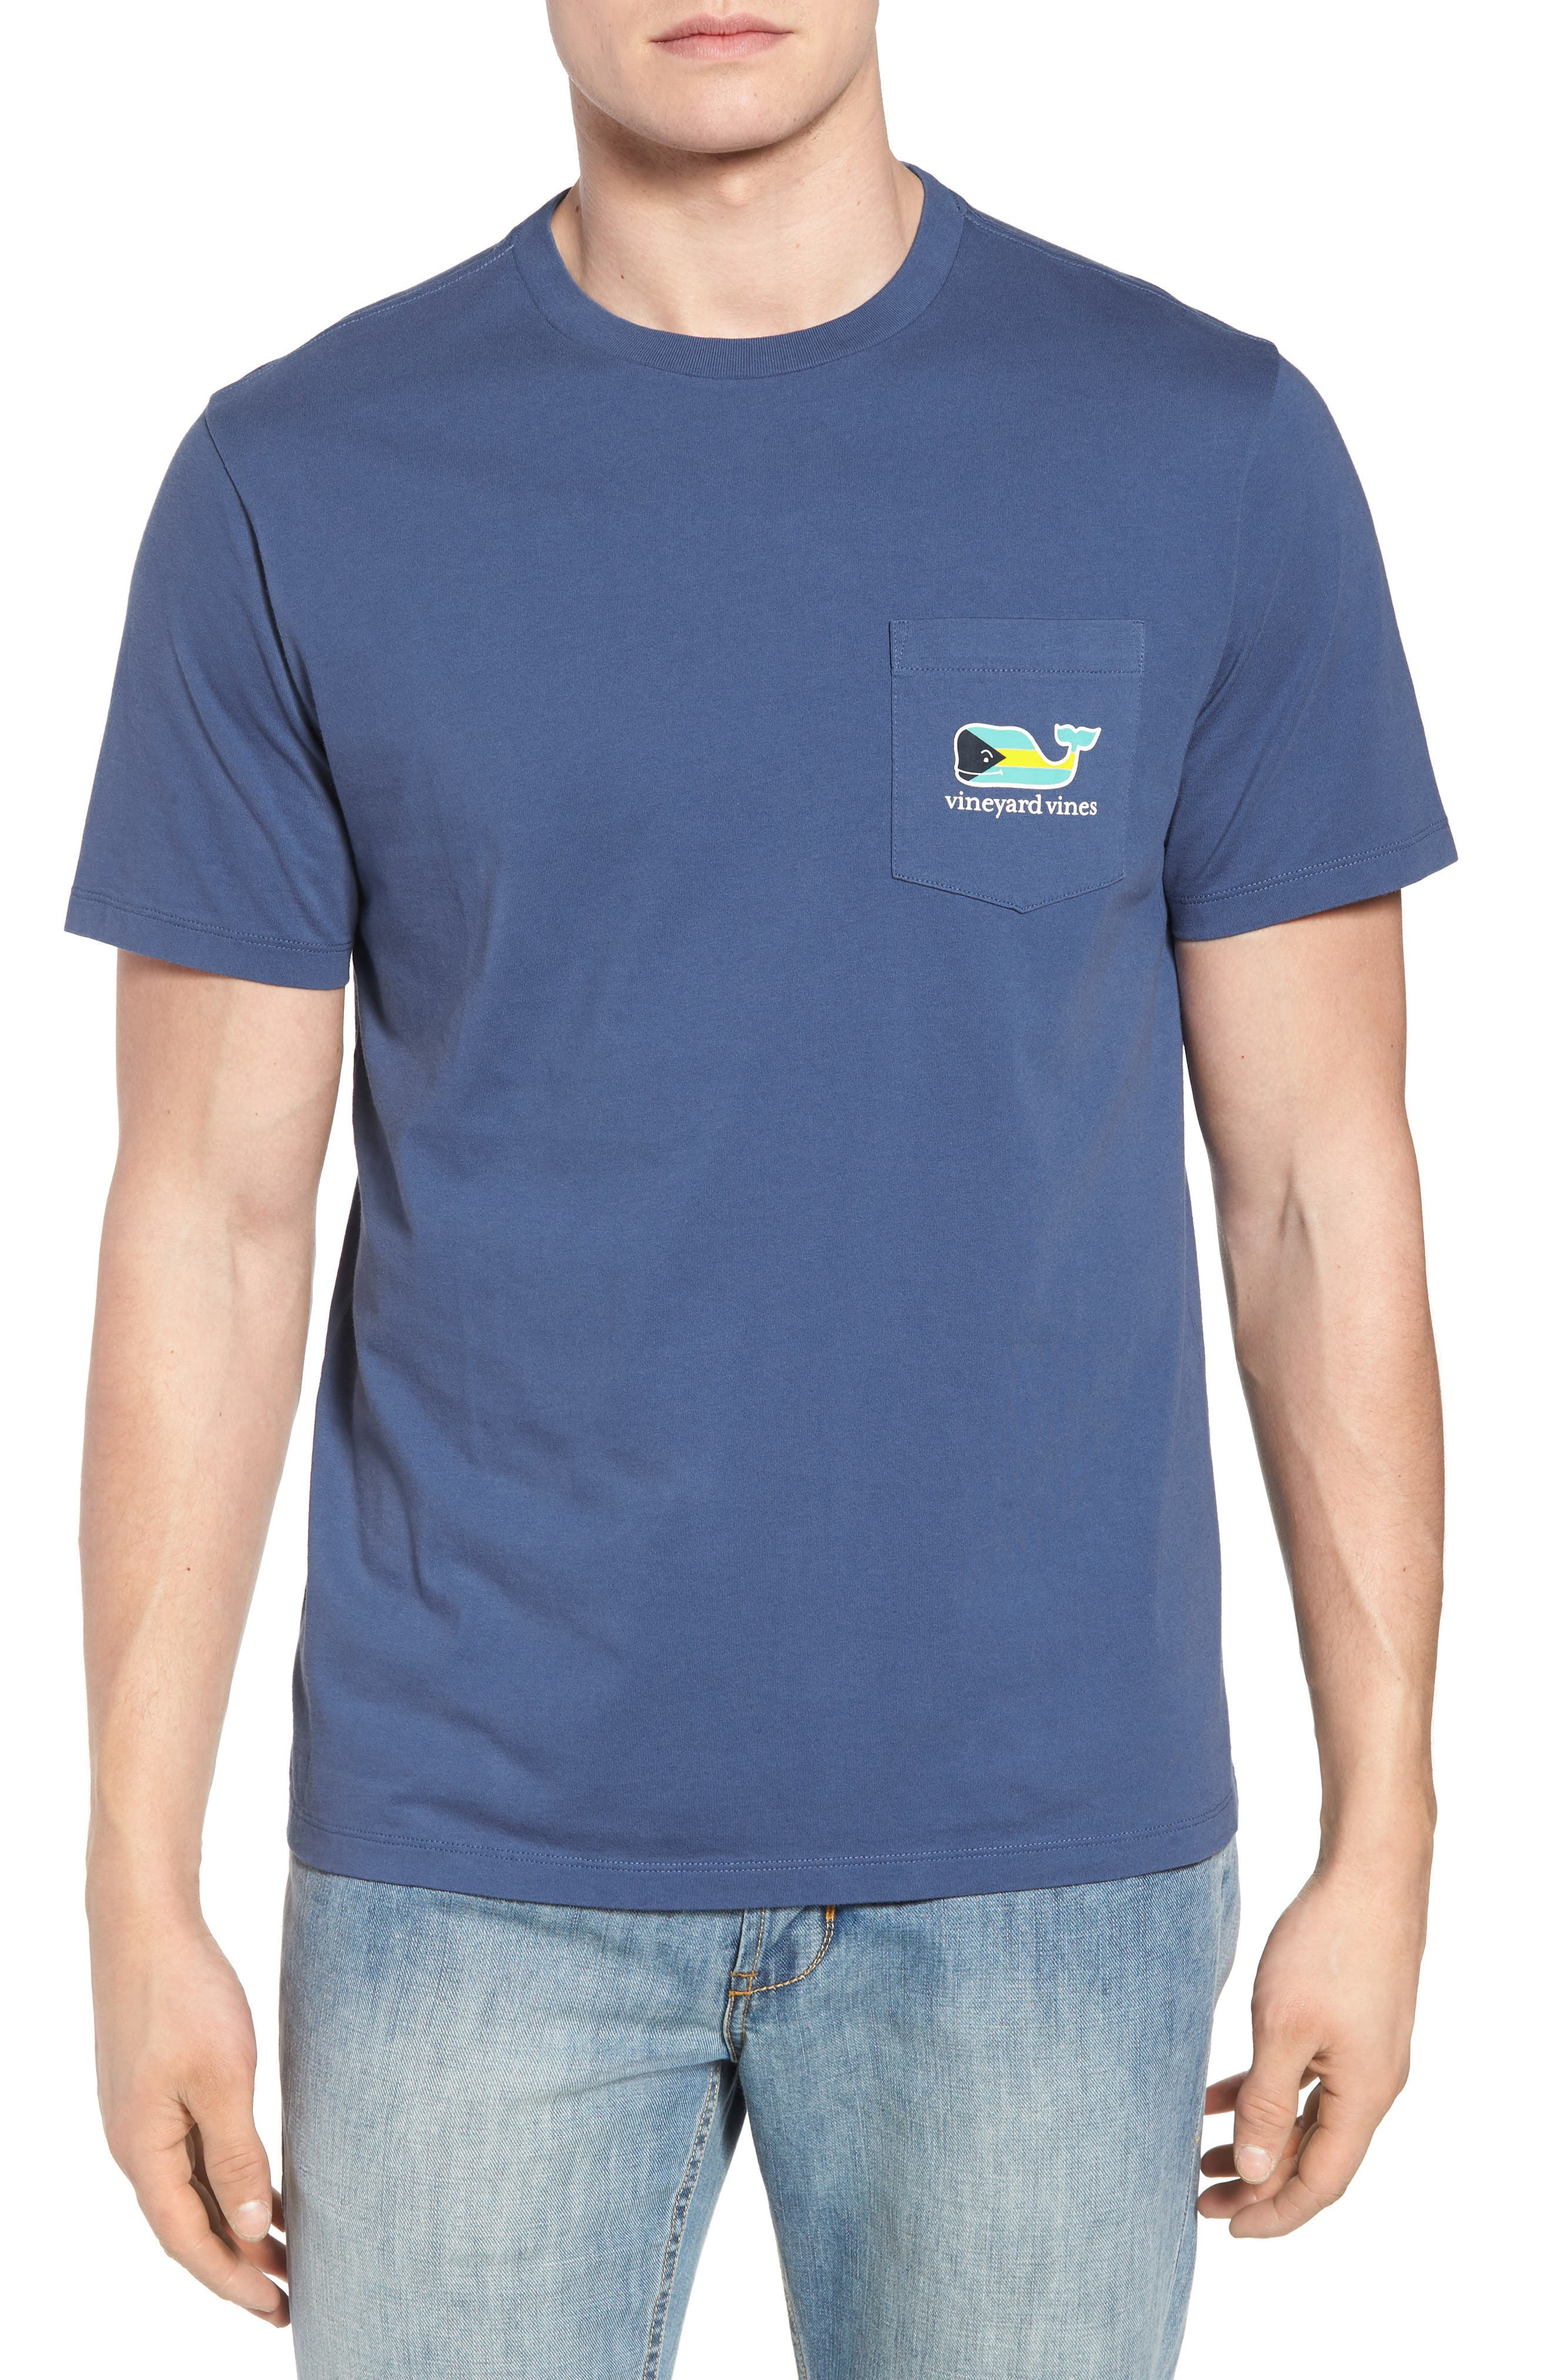 Main Image - vineyard vines Bahamas Whale Crewneck Cotton T-Shirt